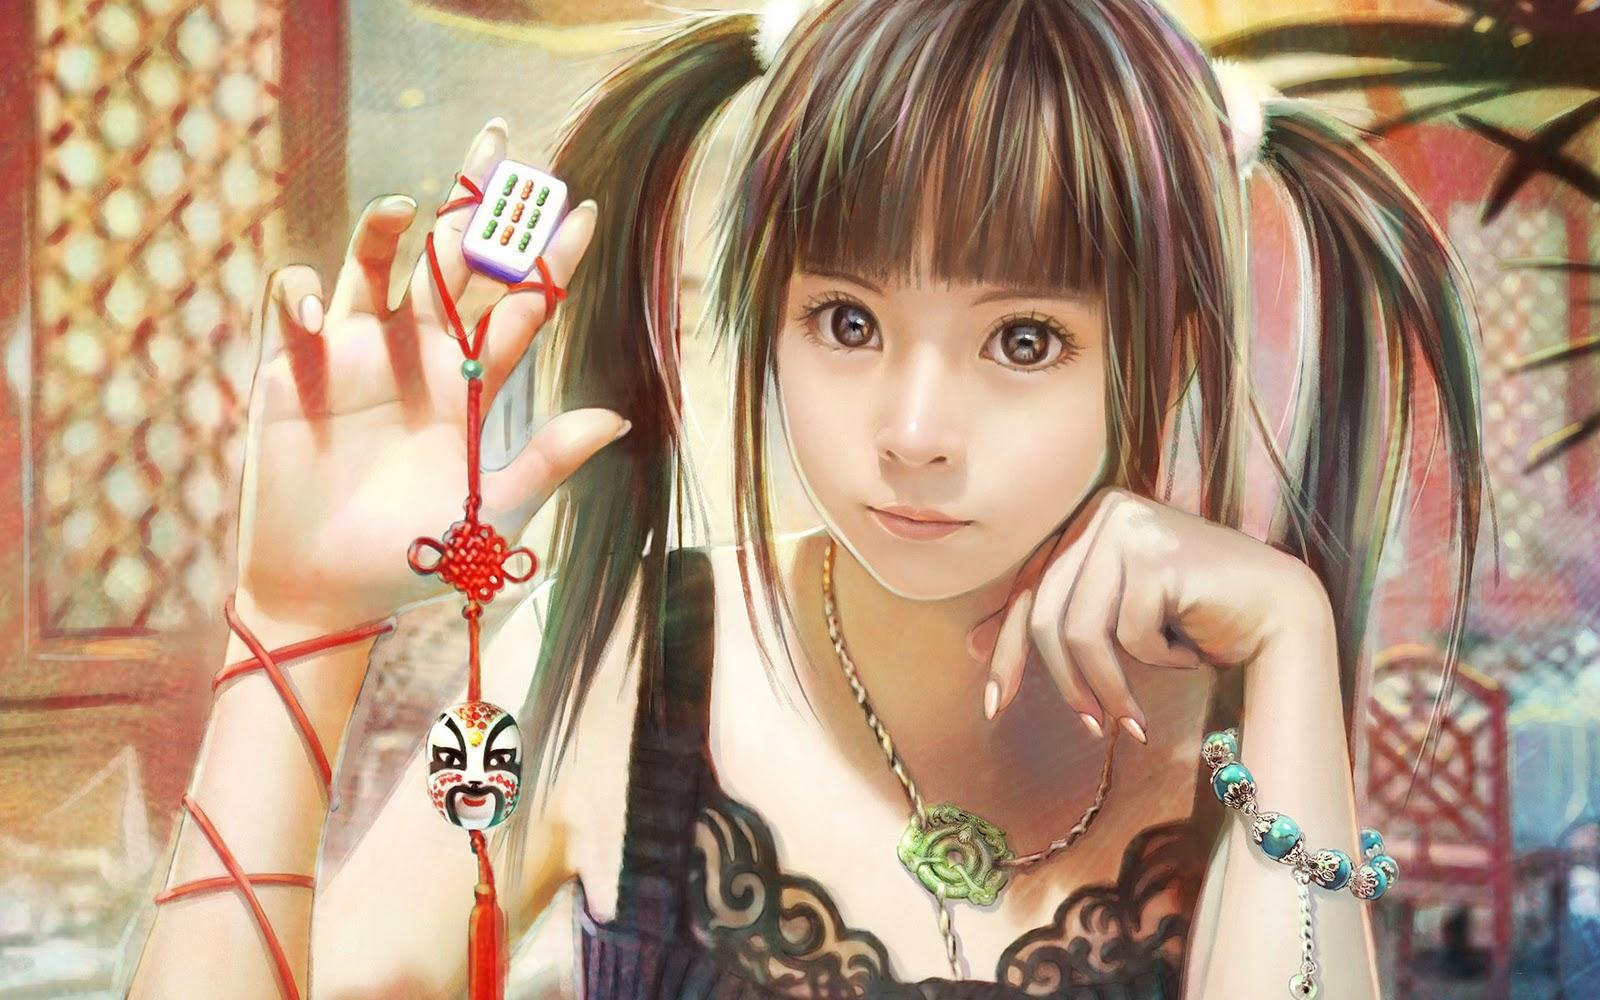 Amazing cg art girls wallpapers - 3d anime wallpaper ...